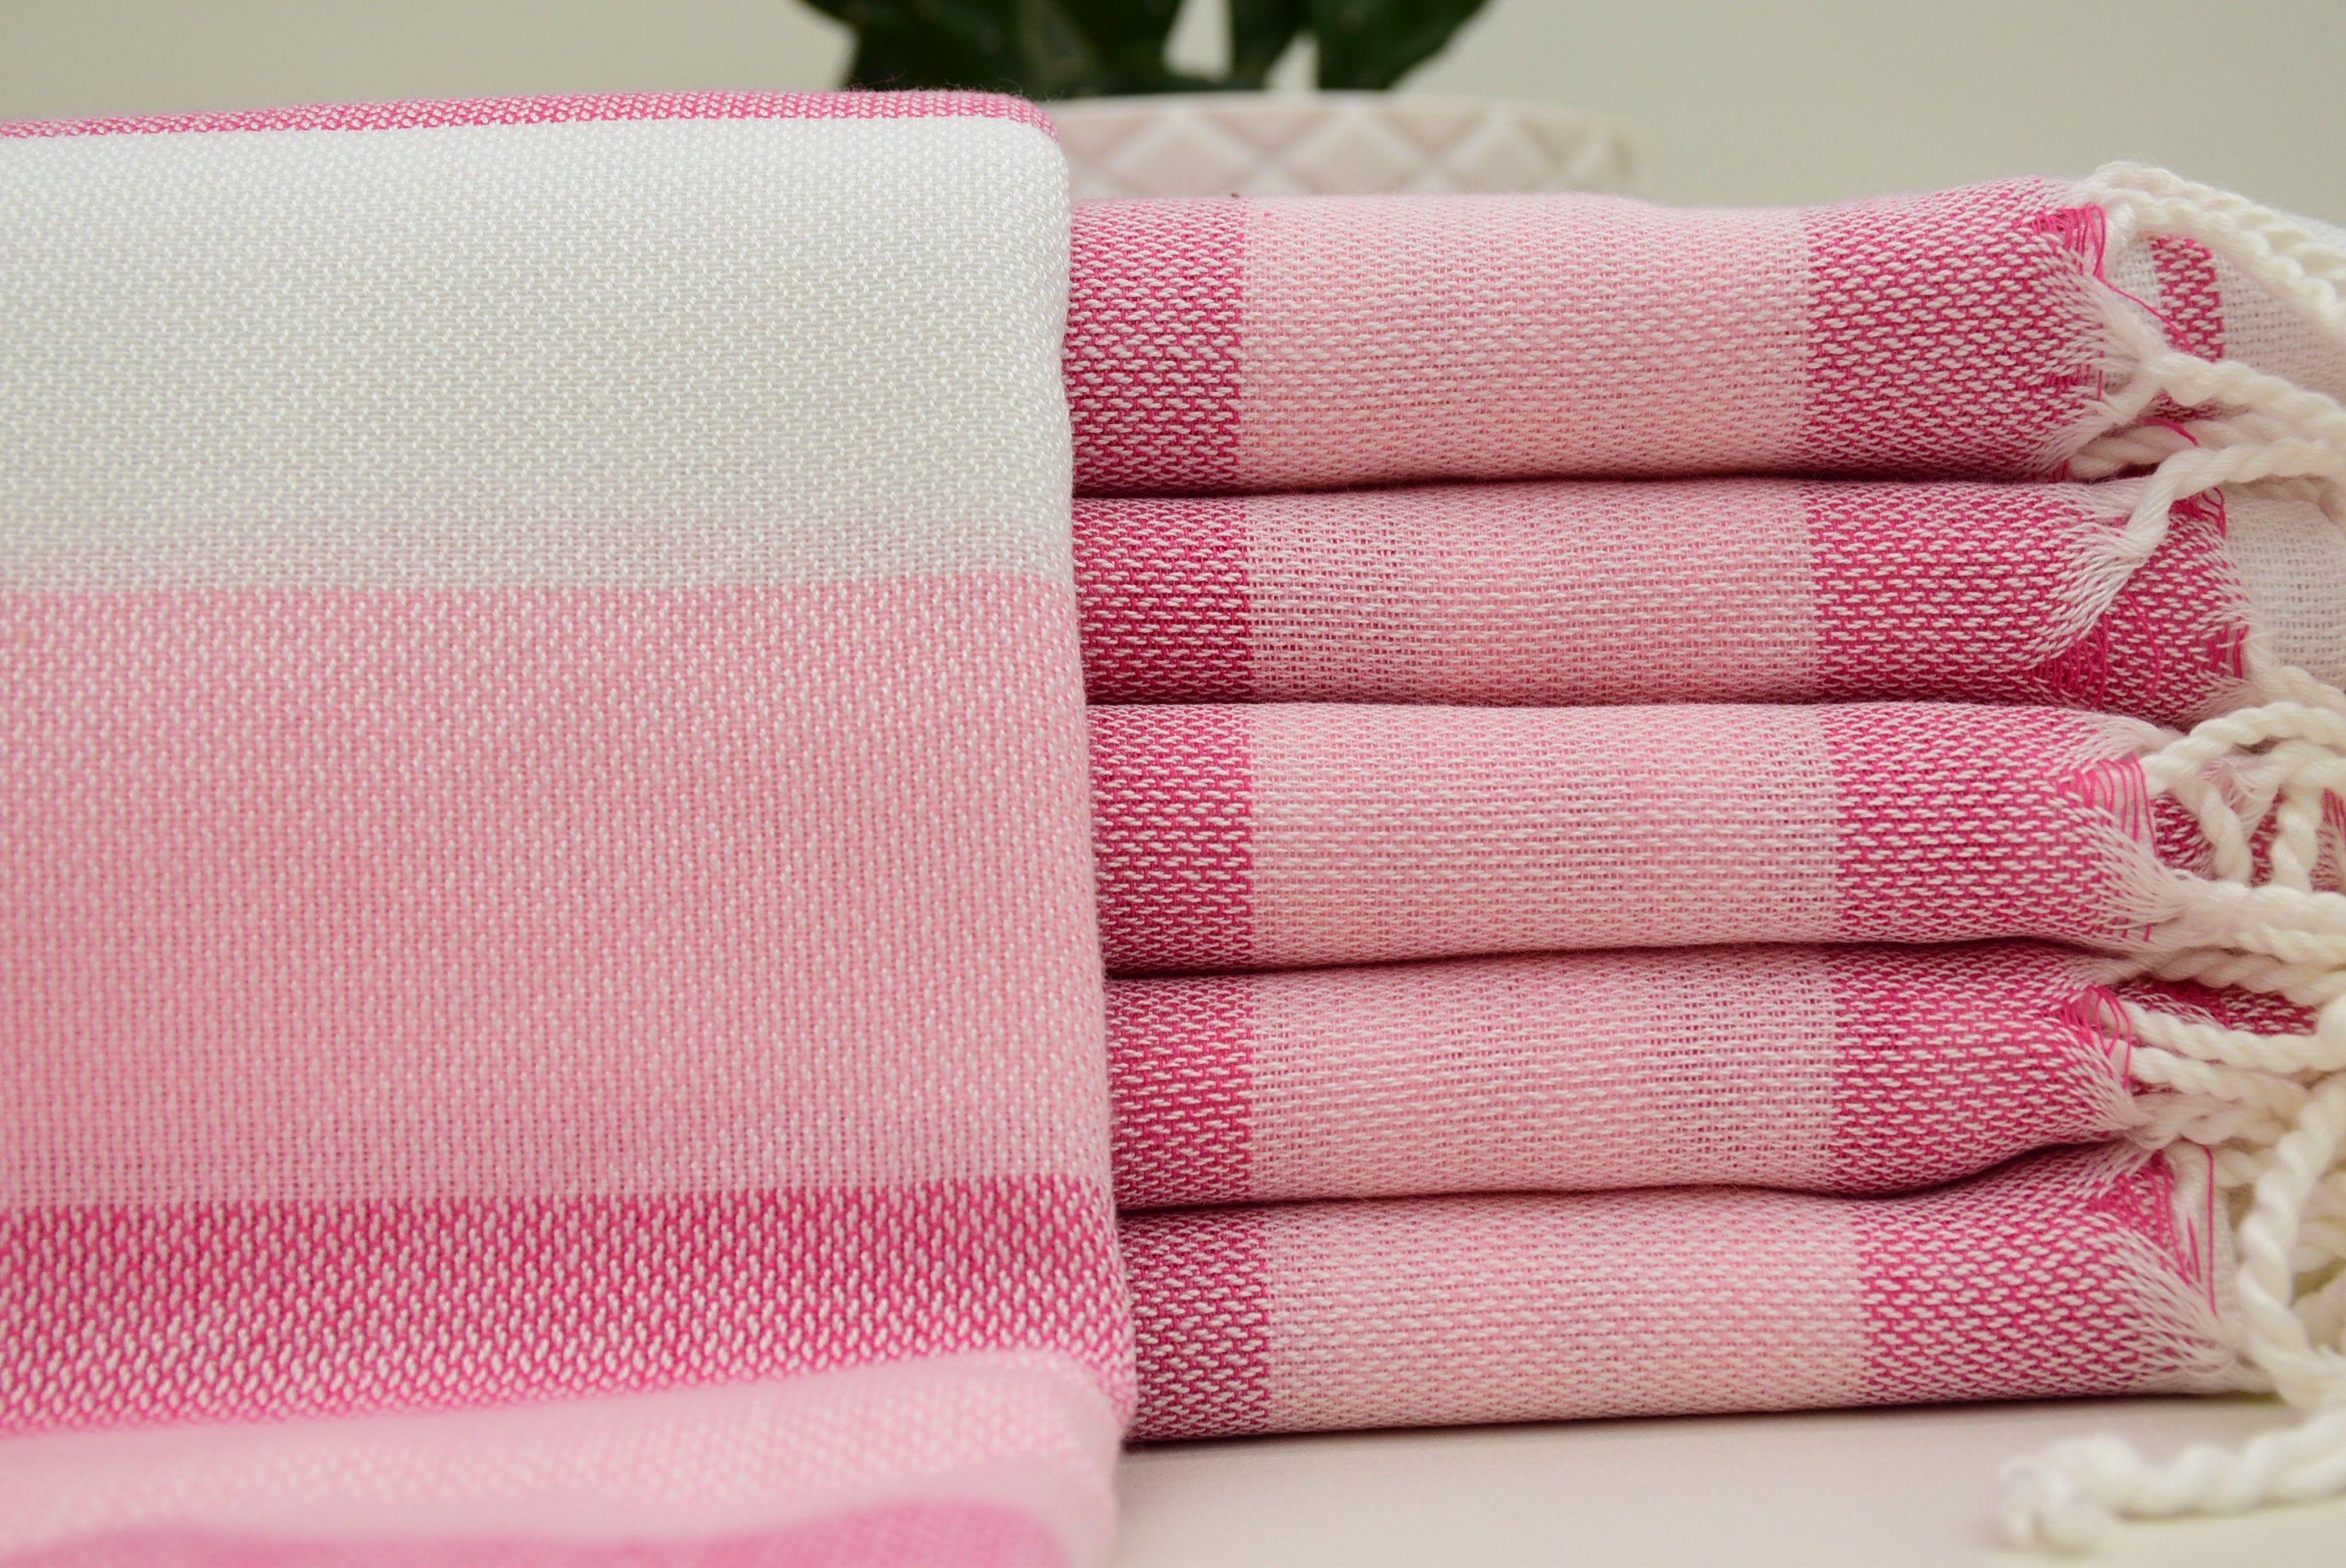 Fuschia Towel Peshtemal Towel Turkish Towel Beach Towel 40x70